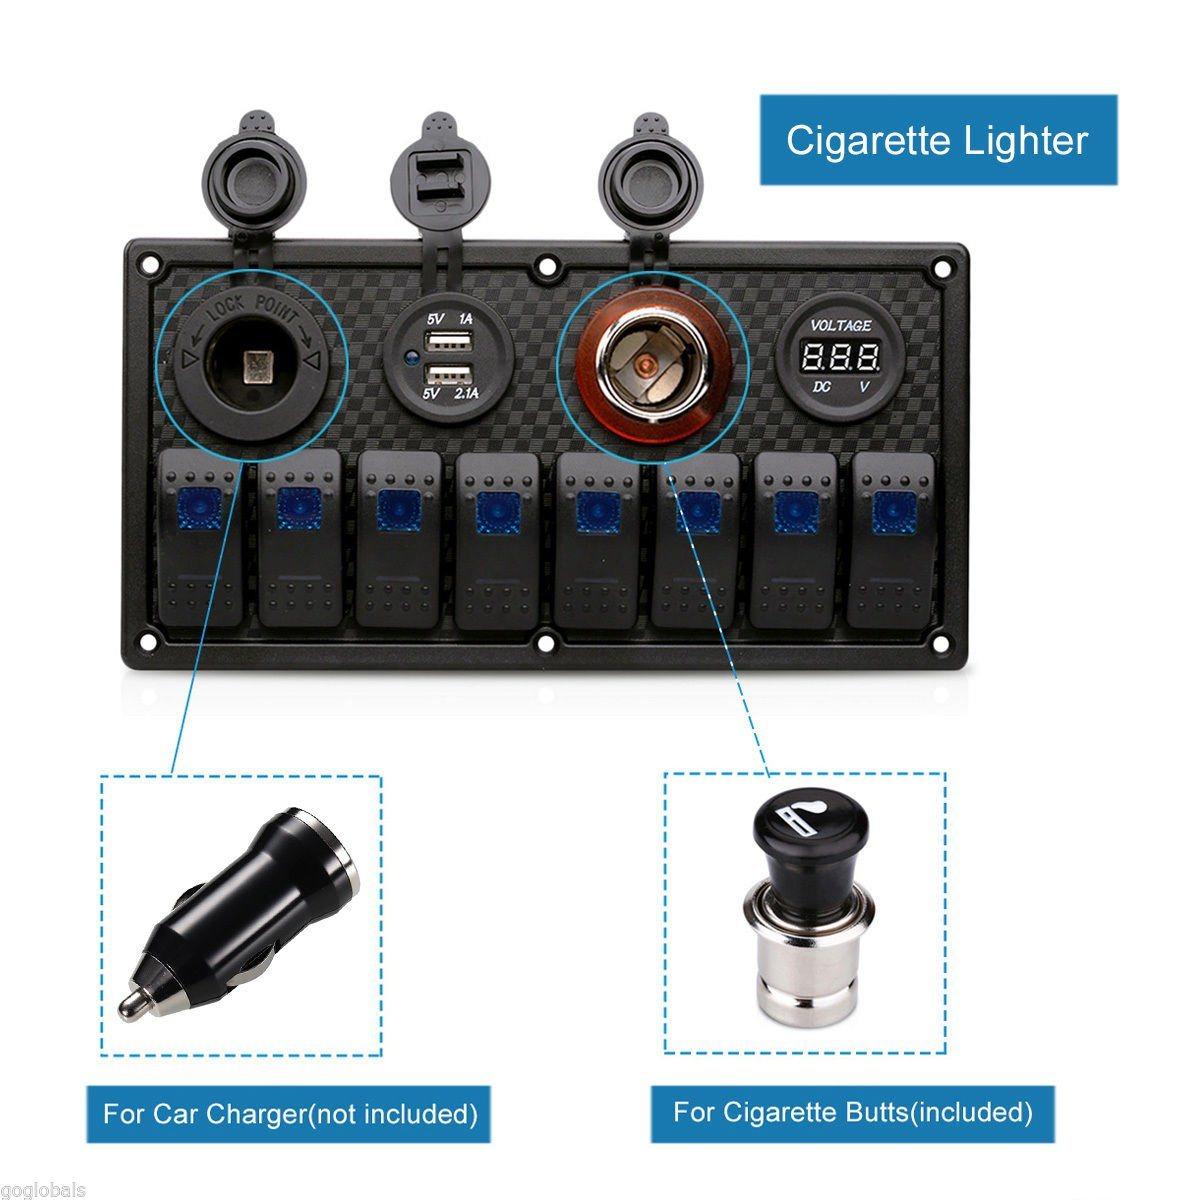 8gang car marine waterproof ar marine waterproof 5 pin boat rocker switch  panel +fuse dual usb slot led light++ power socket breaker voltmeter